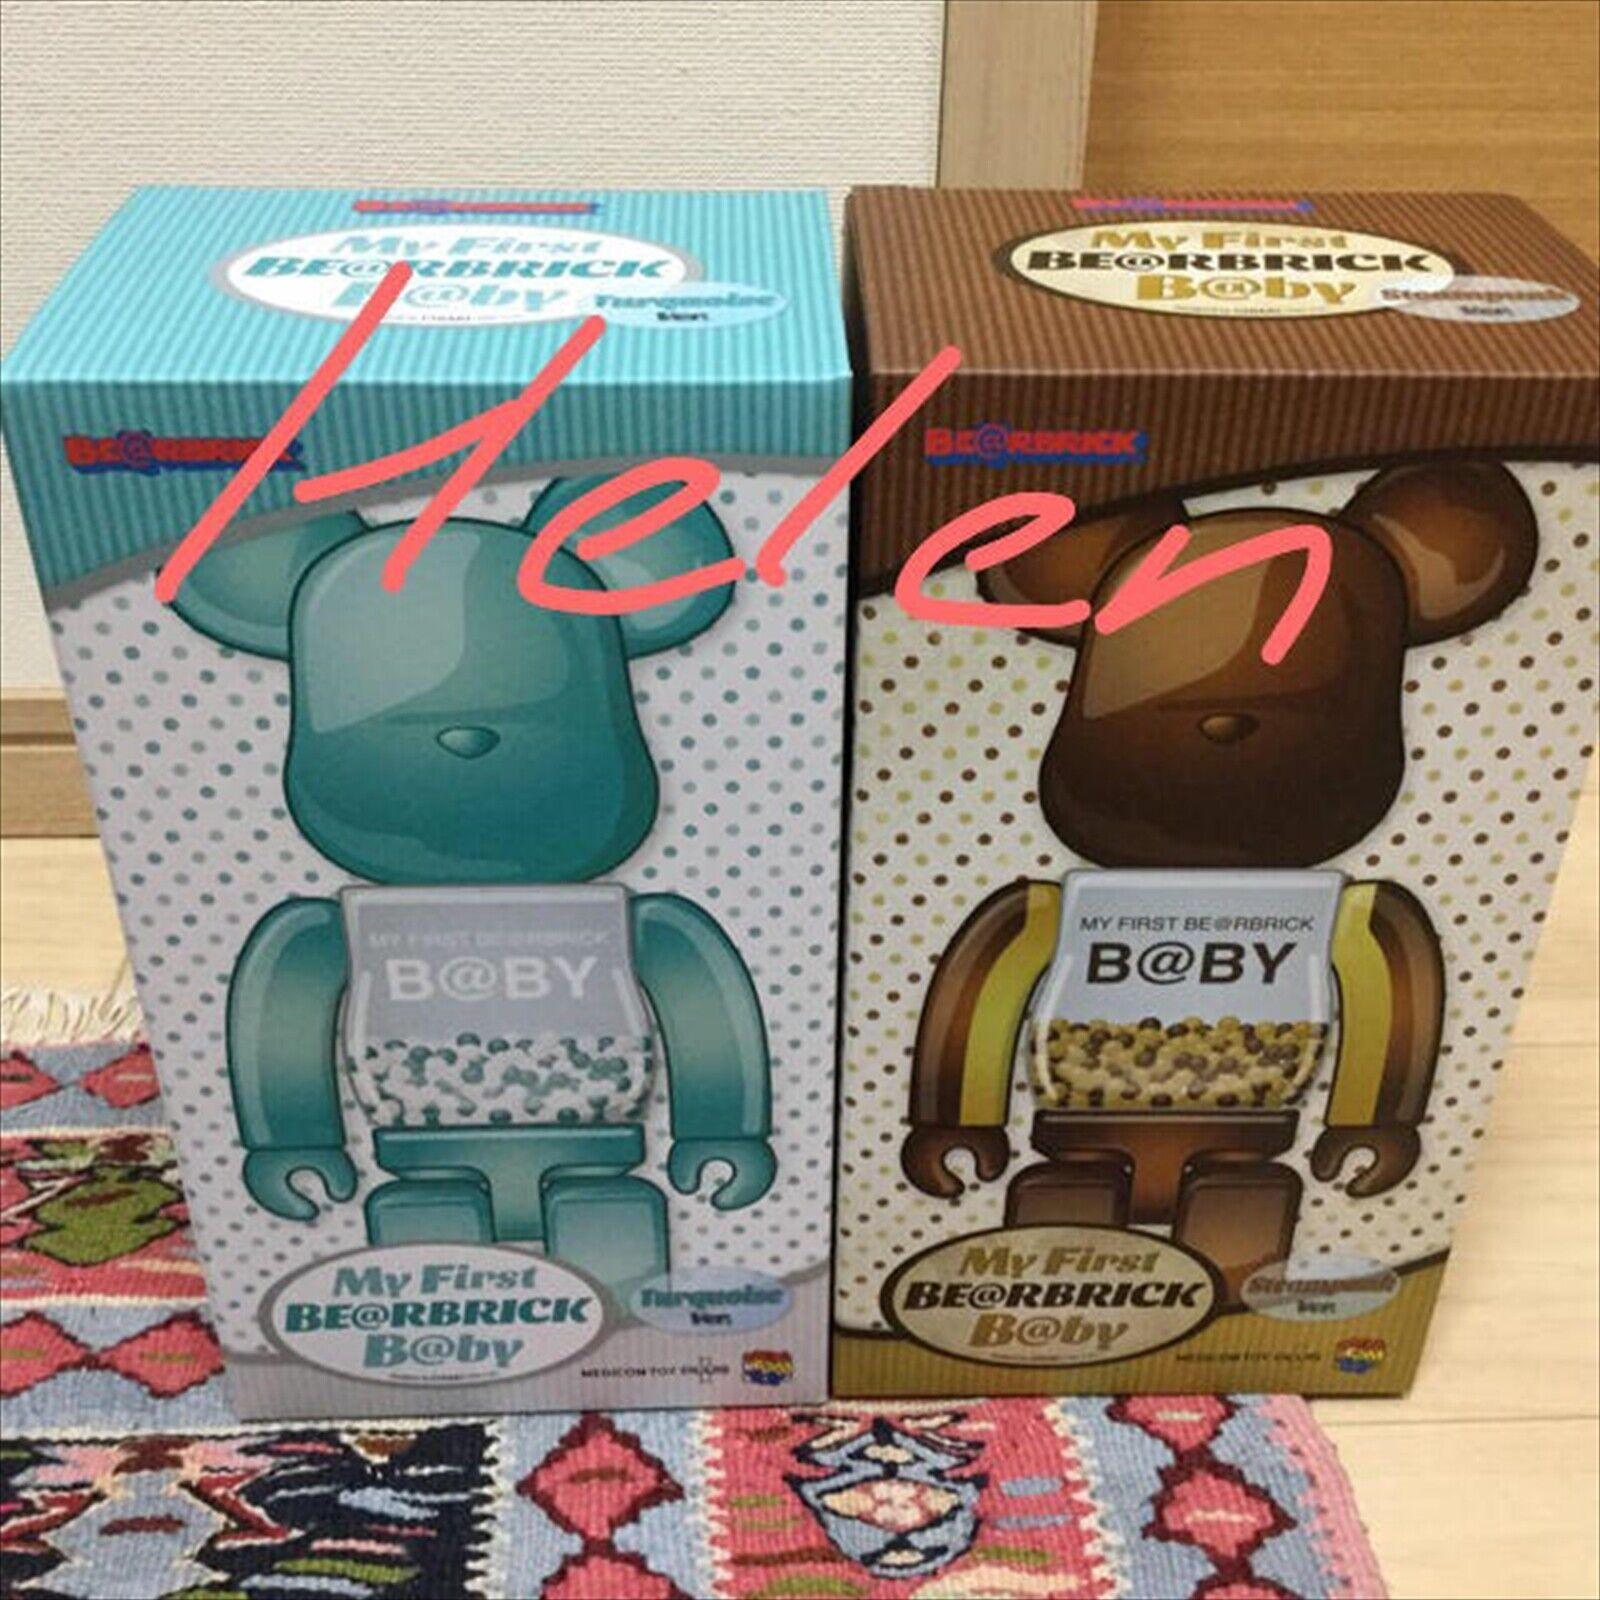 BE@RBRICK 400% My First Steampunk Turquoise Set Medicom Medicom Toy Figure